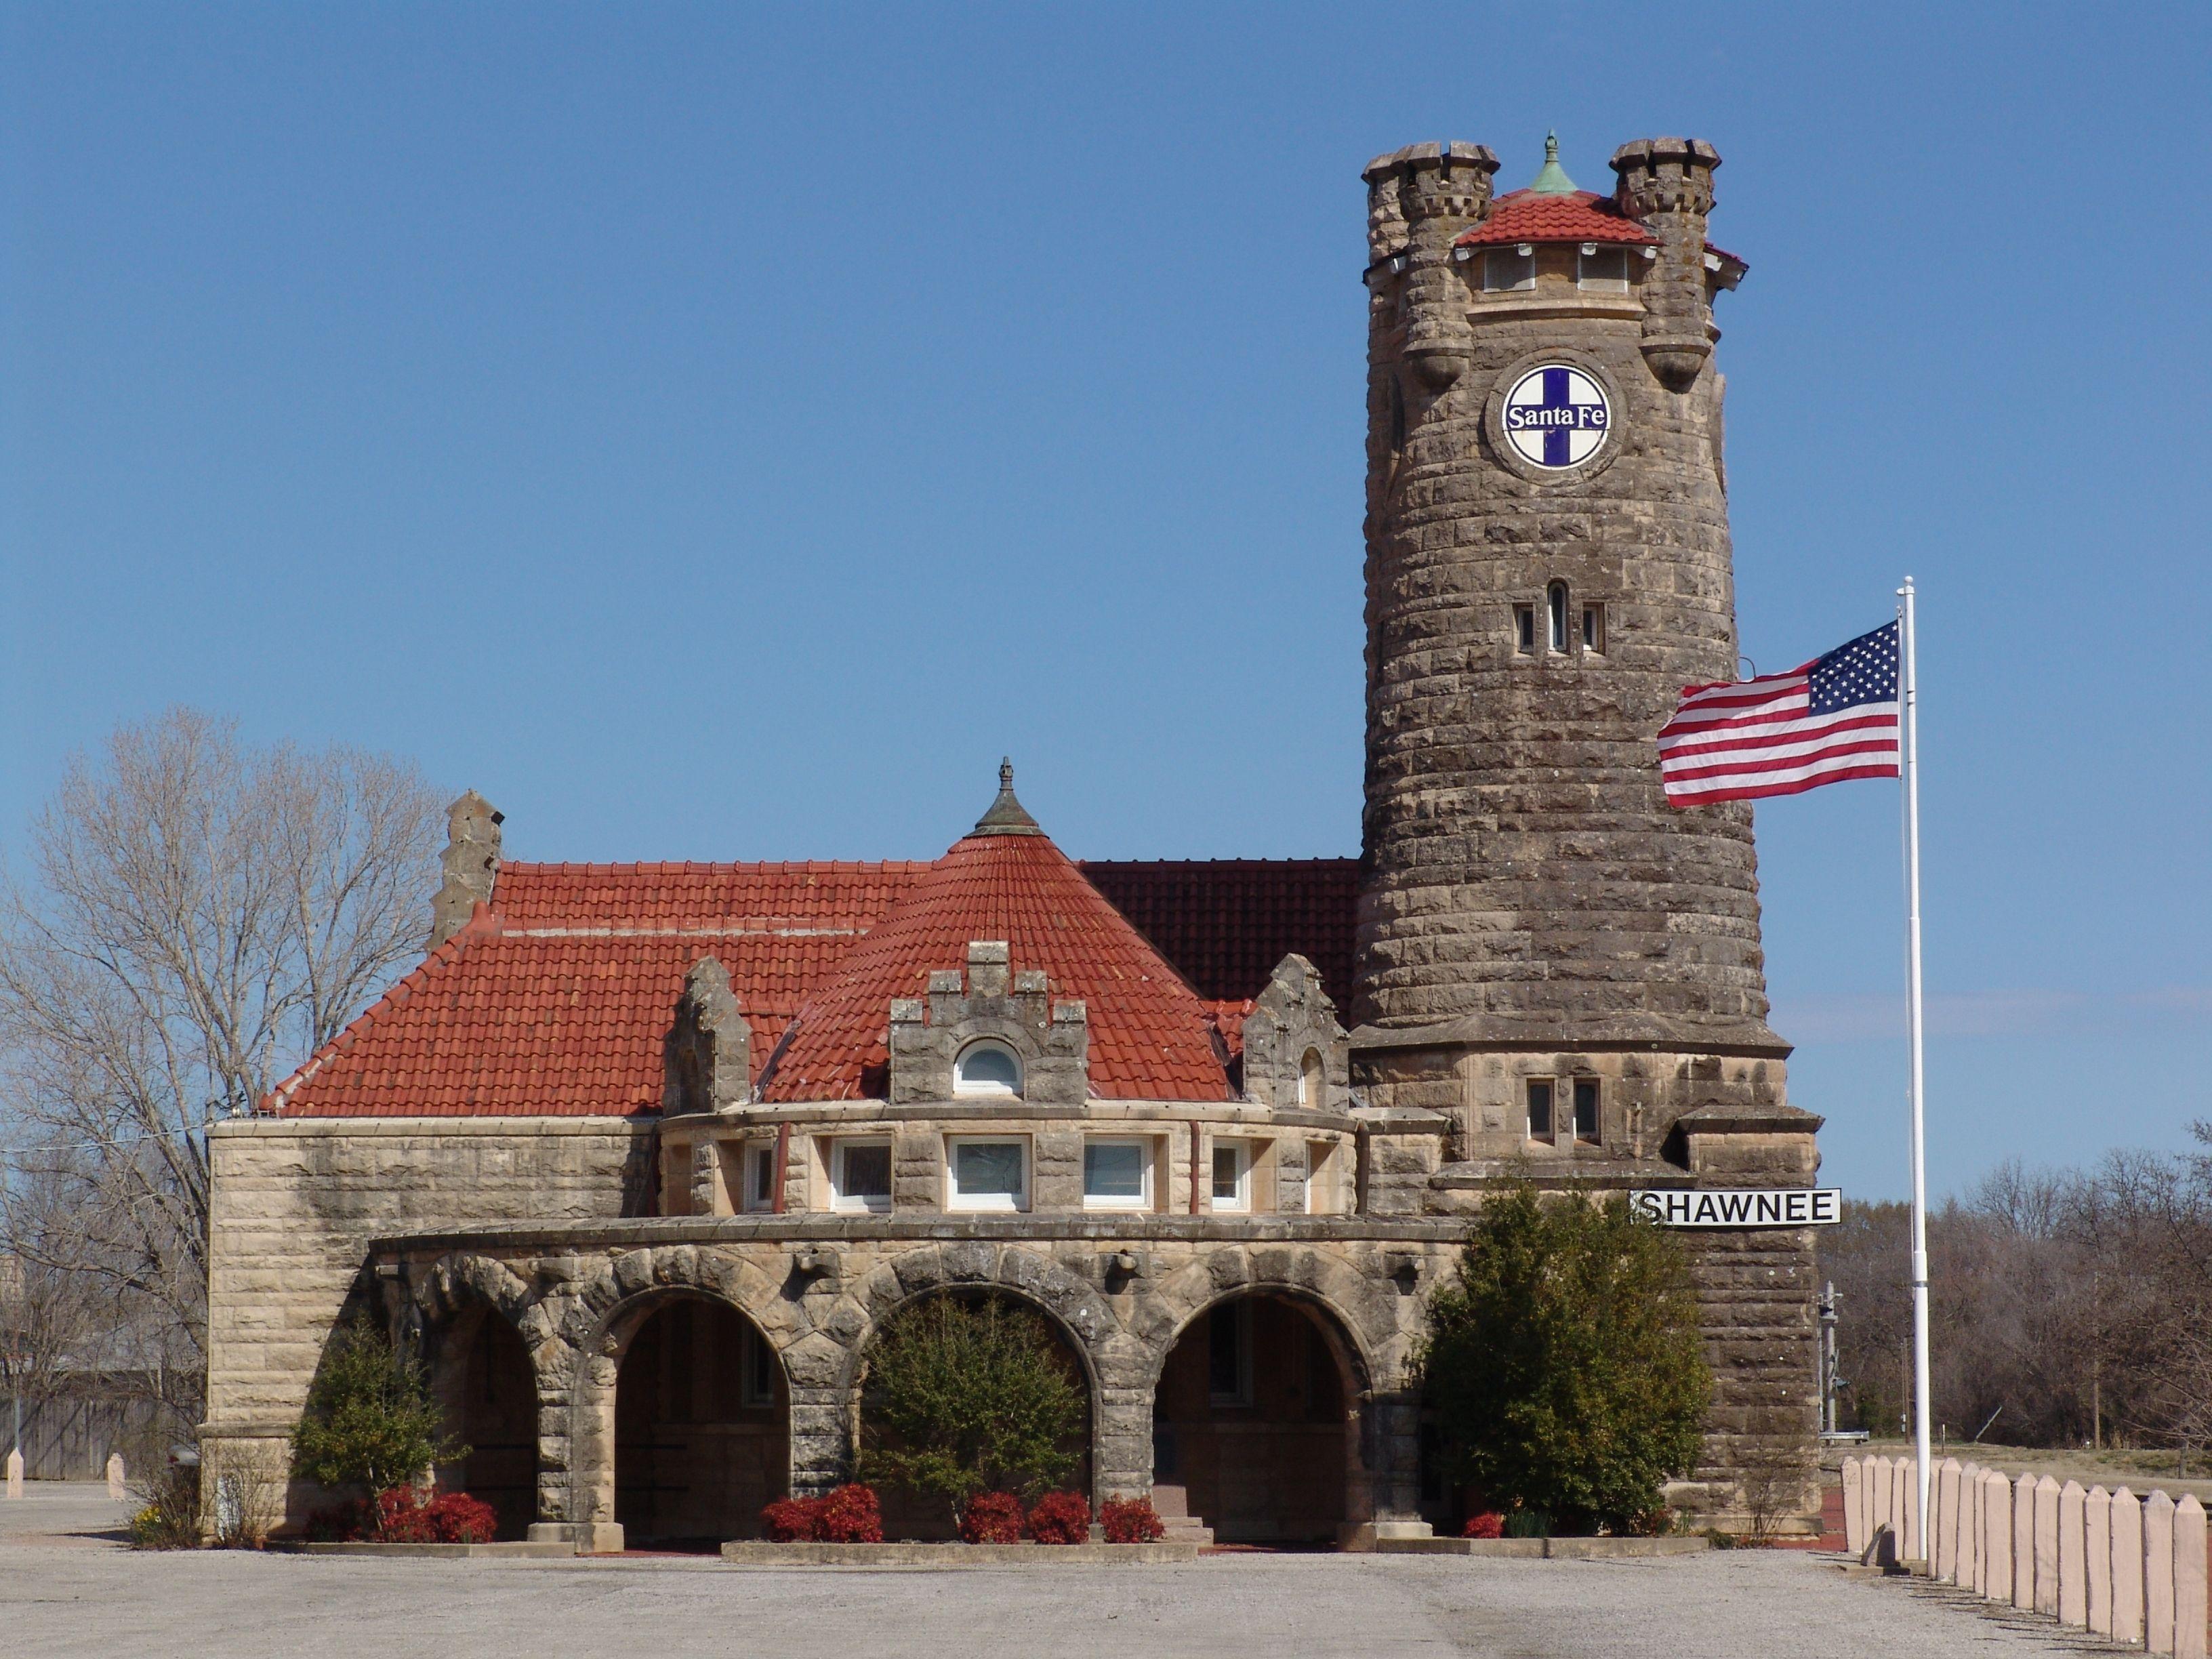 Old Santa Fe Train Depot Shawnee Oklahoma Train Depot Railroad Station Train Station